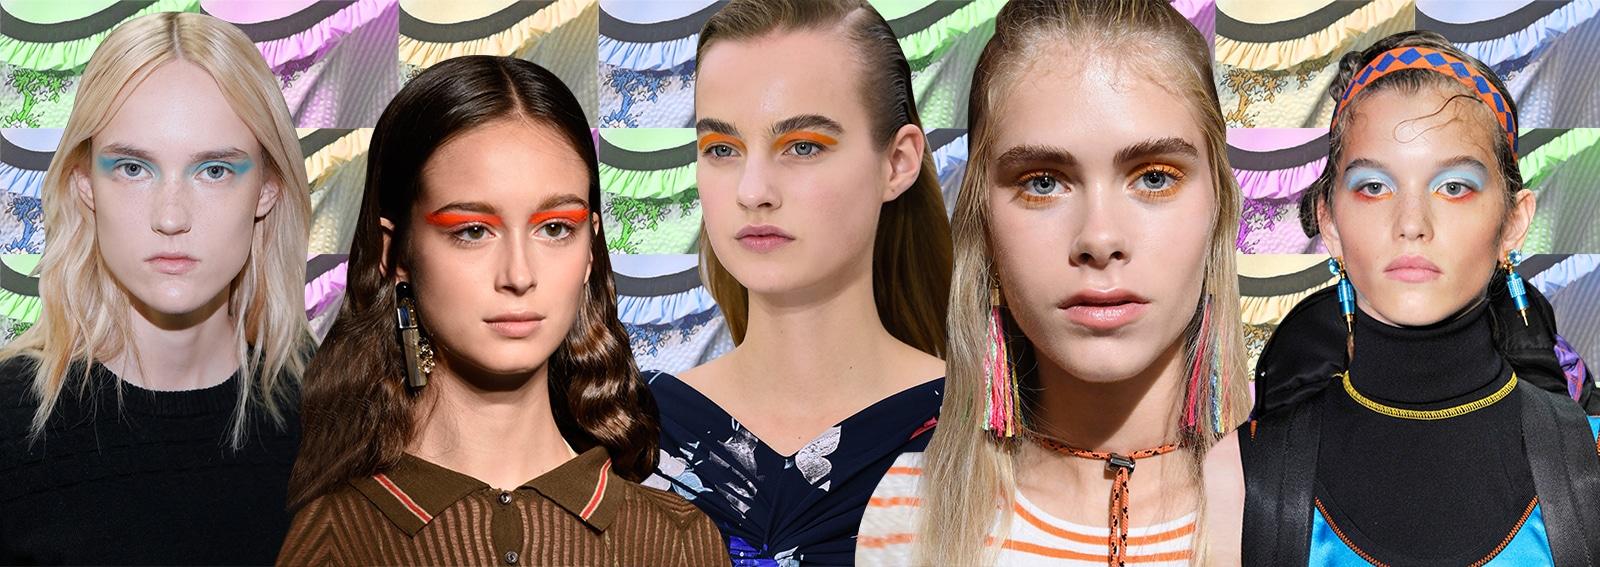 SS17-Beauty-Trend-Occhi-Colorati_desktop